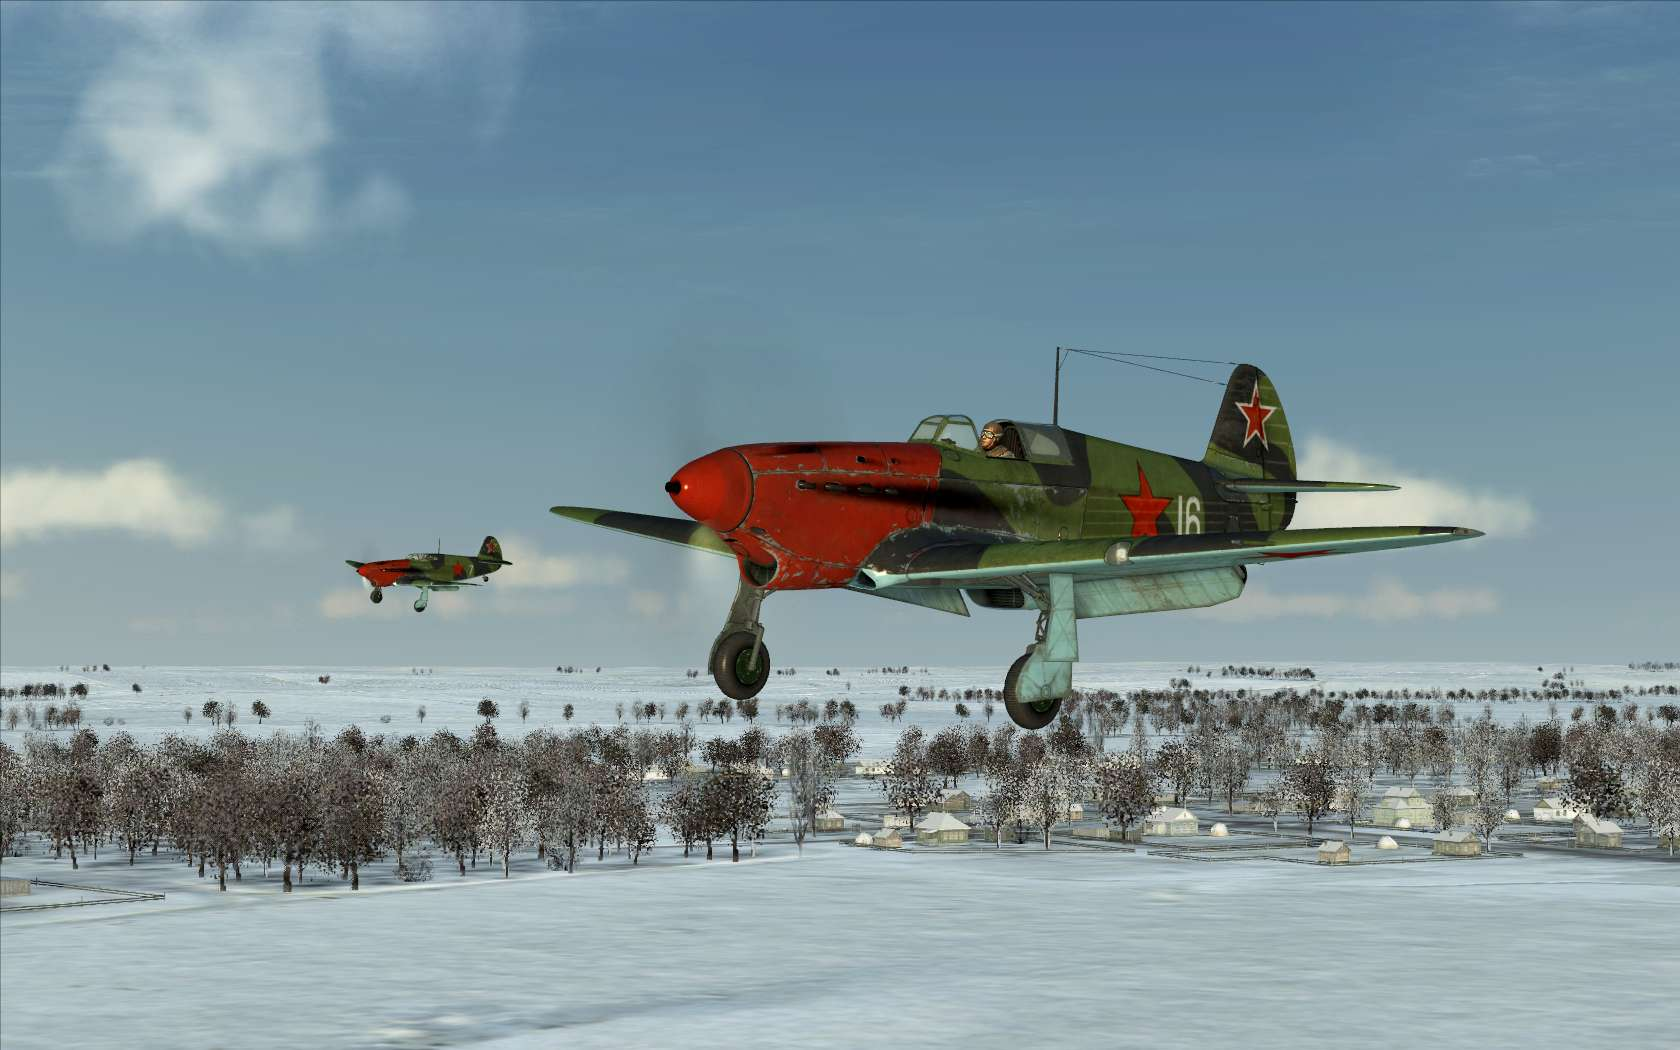 Mission M3 510